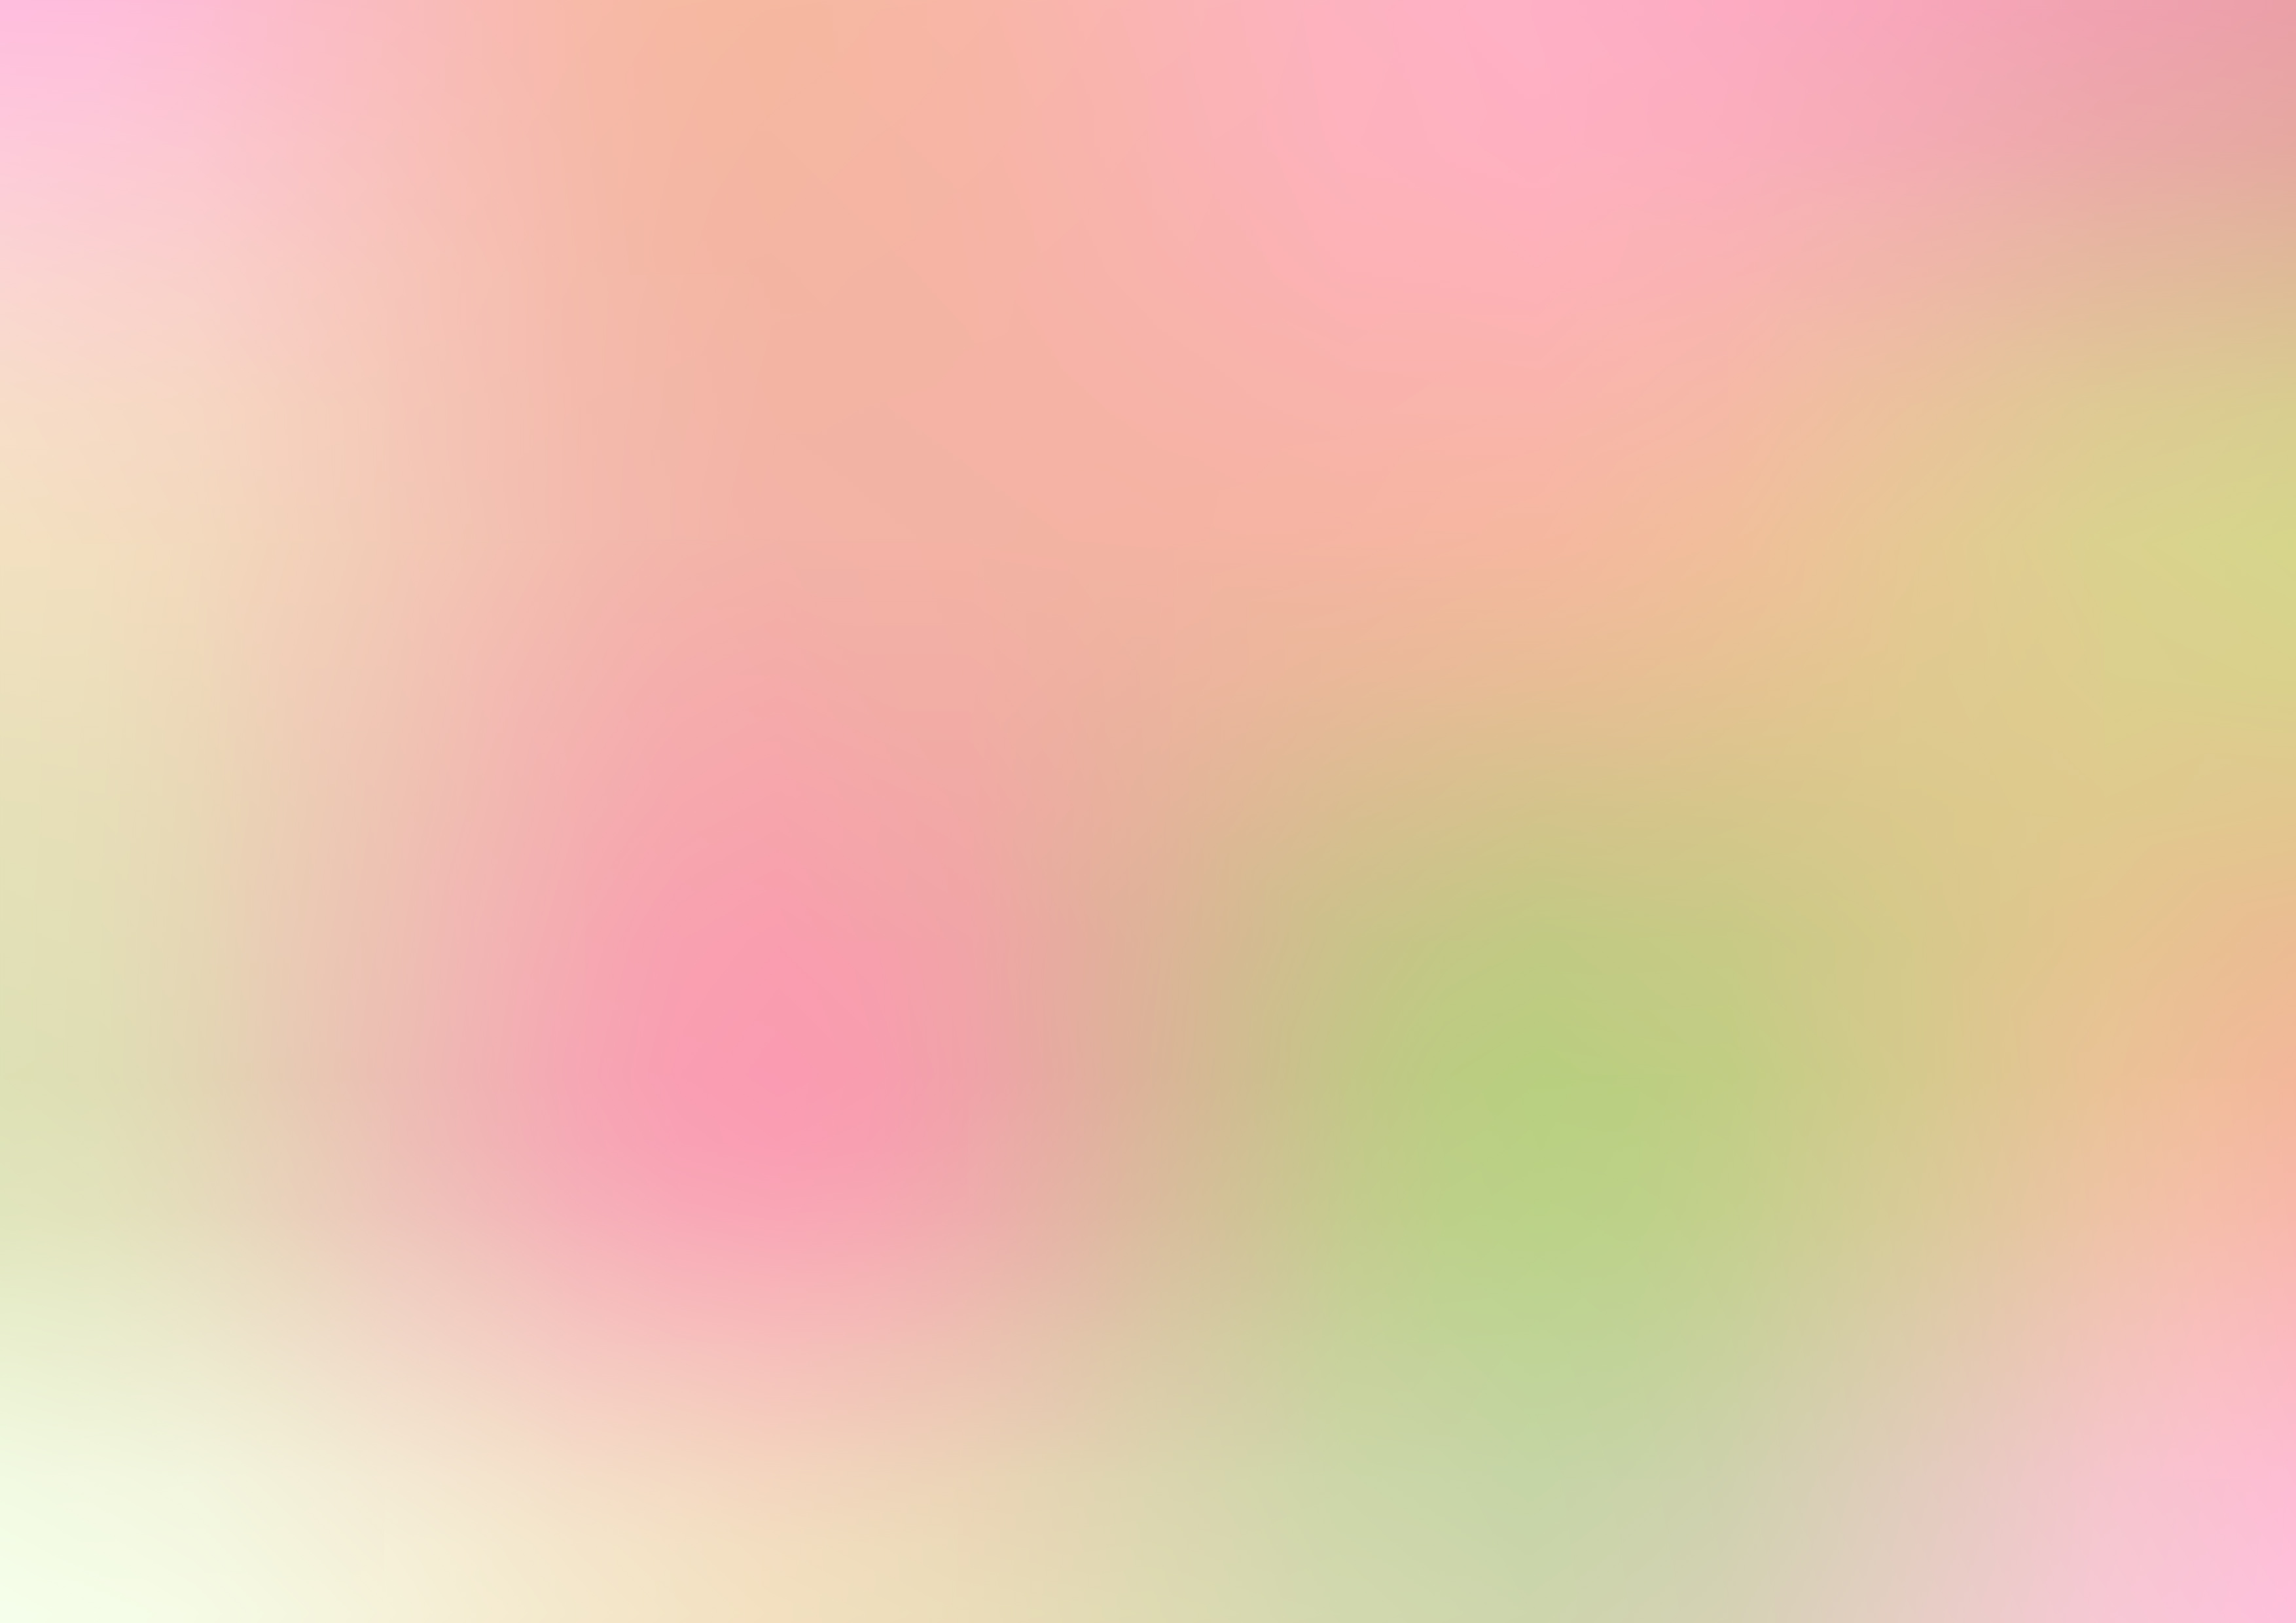 la tapisserie historique dans la lumi u00e8re sch u00e9ma sun conception image de fond pour le